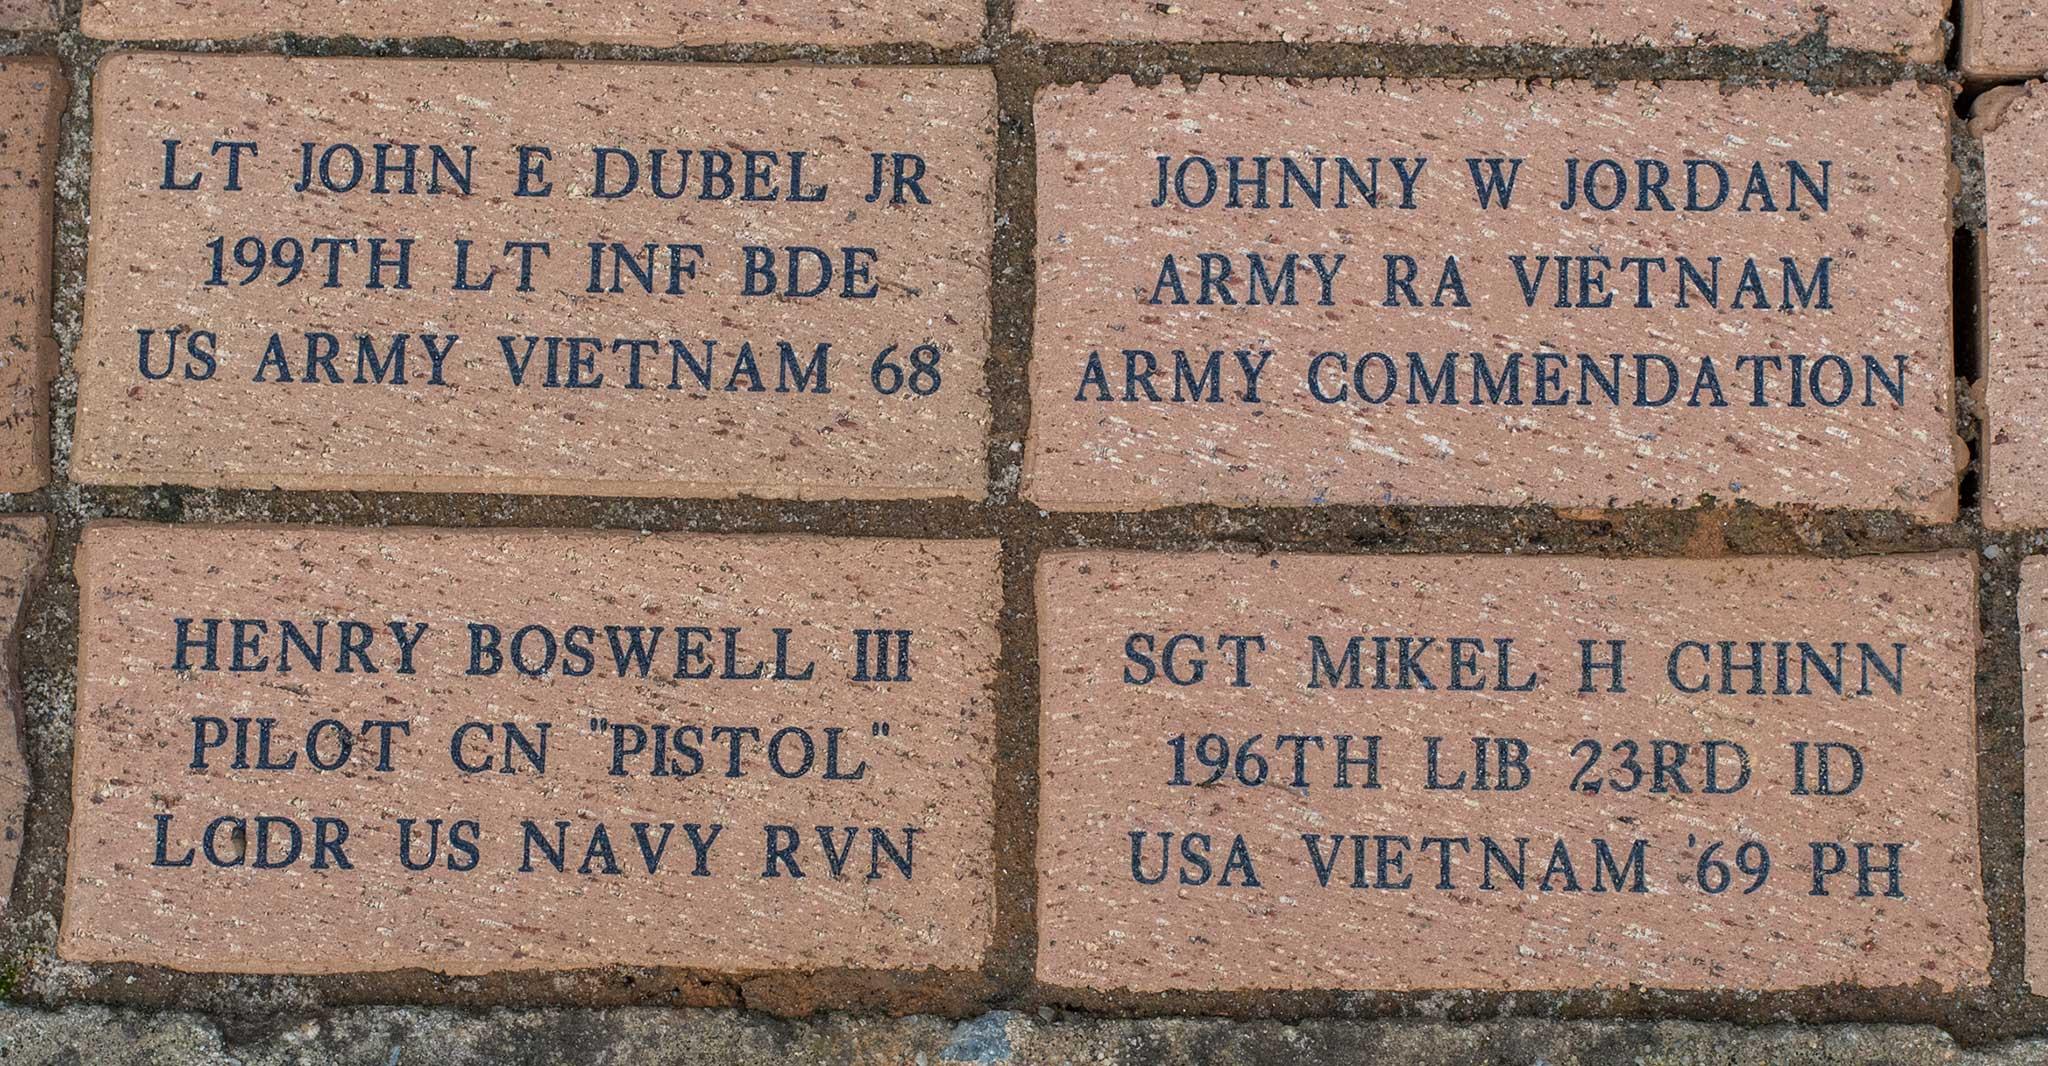 LT JOHN E DUBEL JR 199TH LT INF BDE US ARMY VIETNAM 68